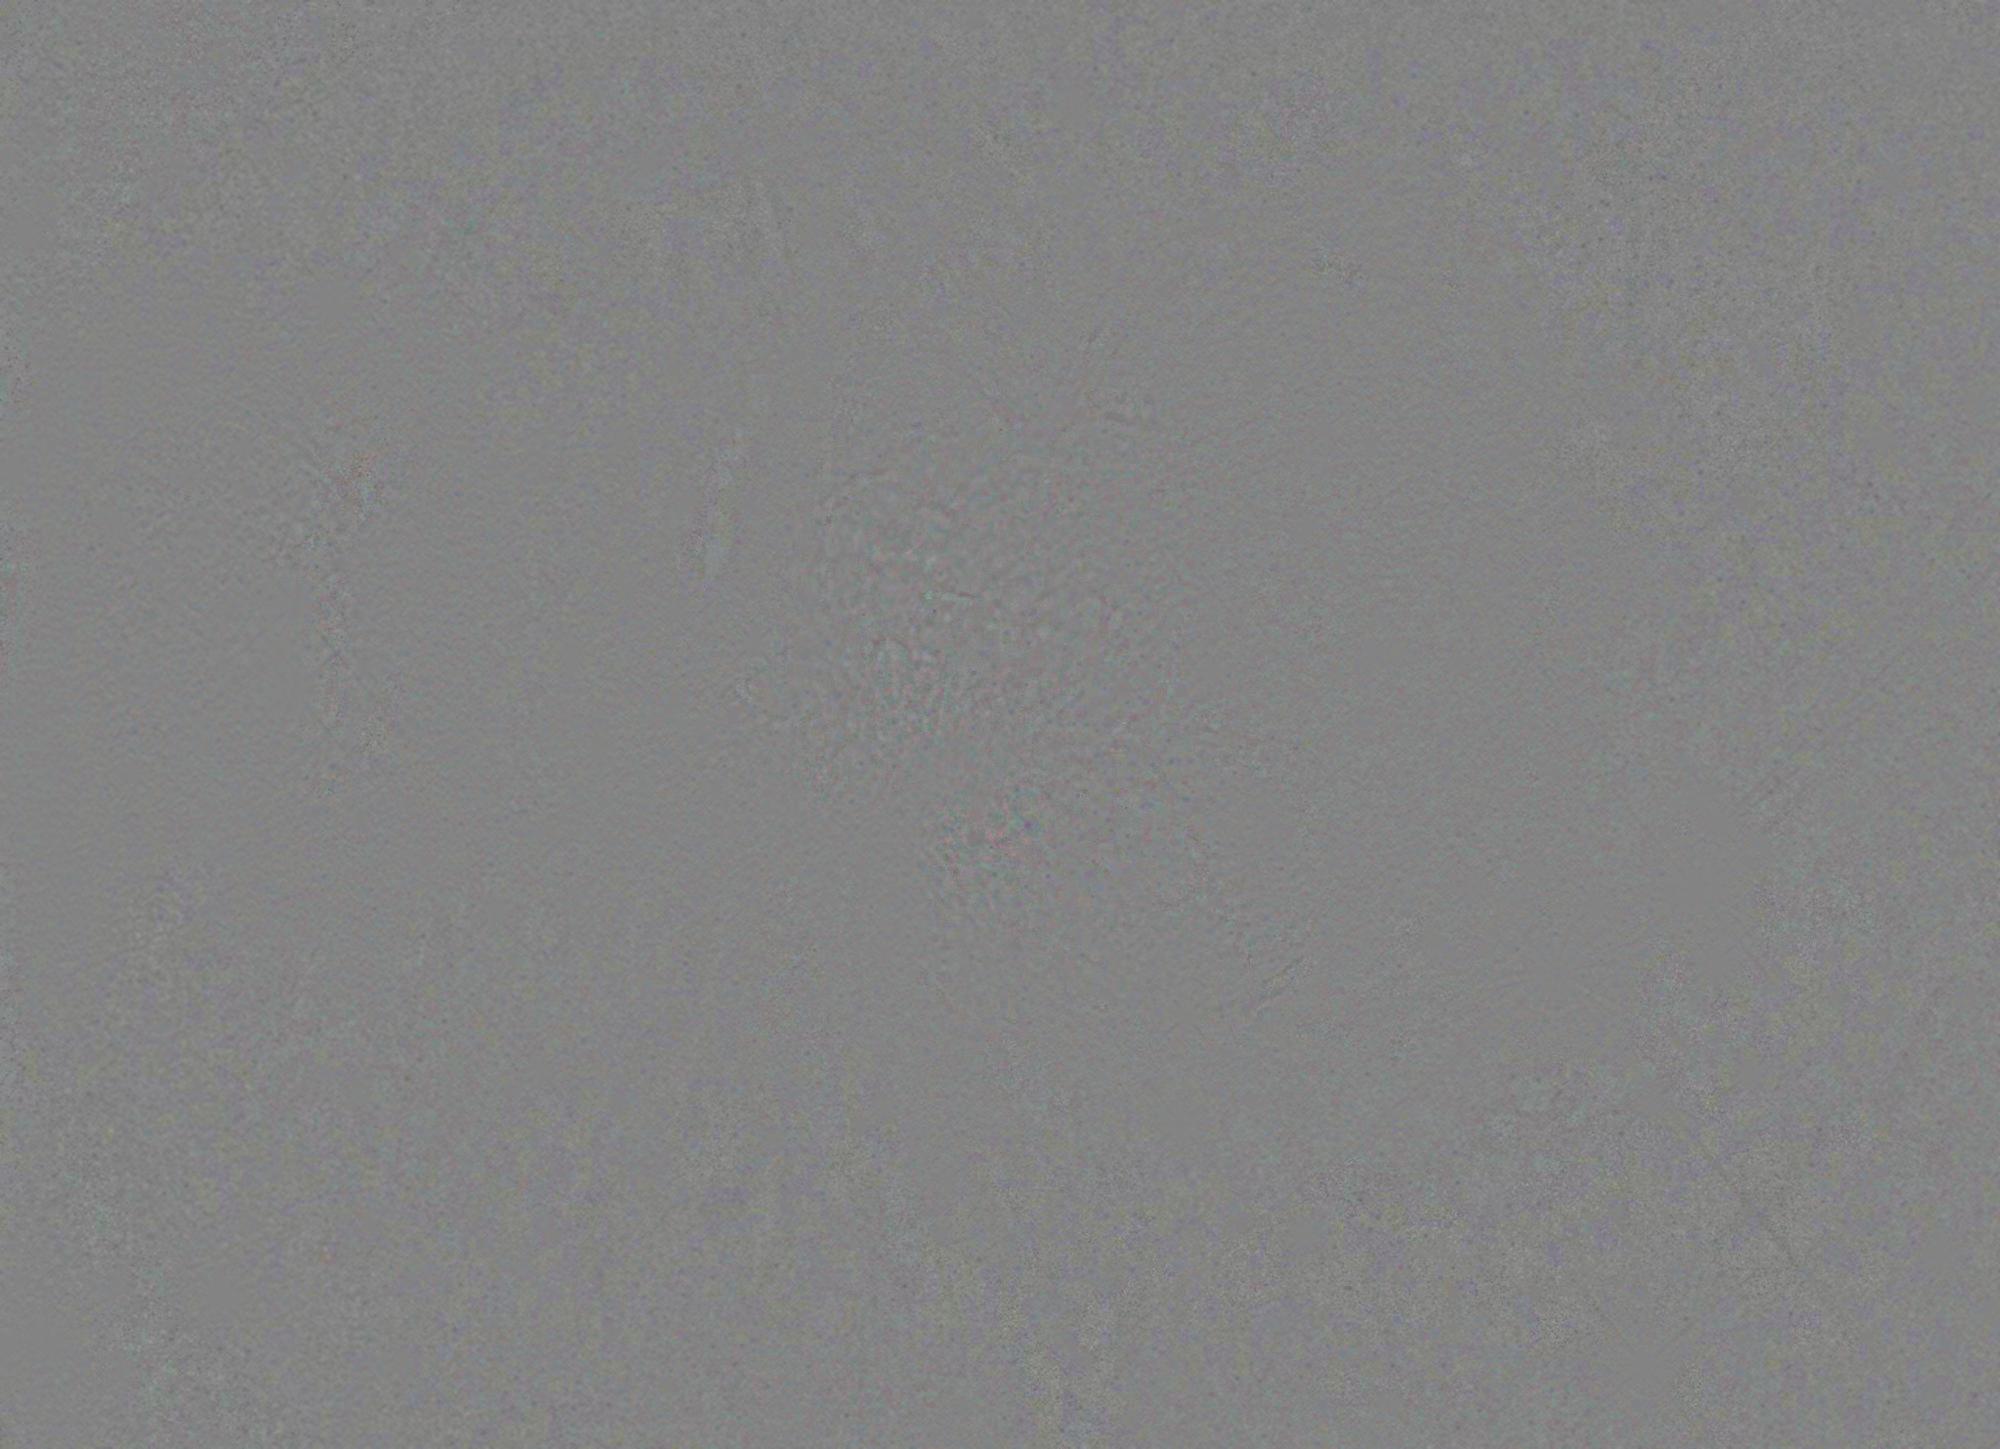 orion_diff.png.8c8c13b38951befc7dc39d7e39da0fb1.png